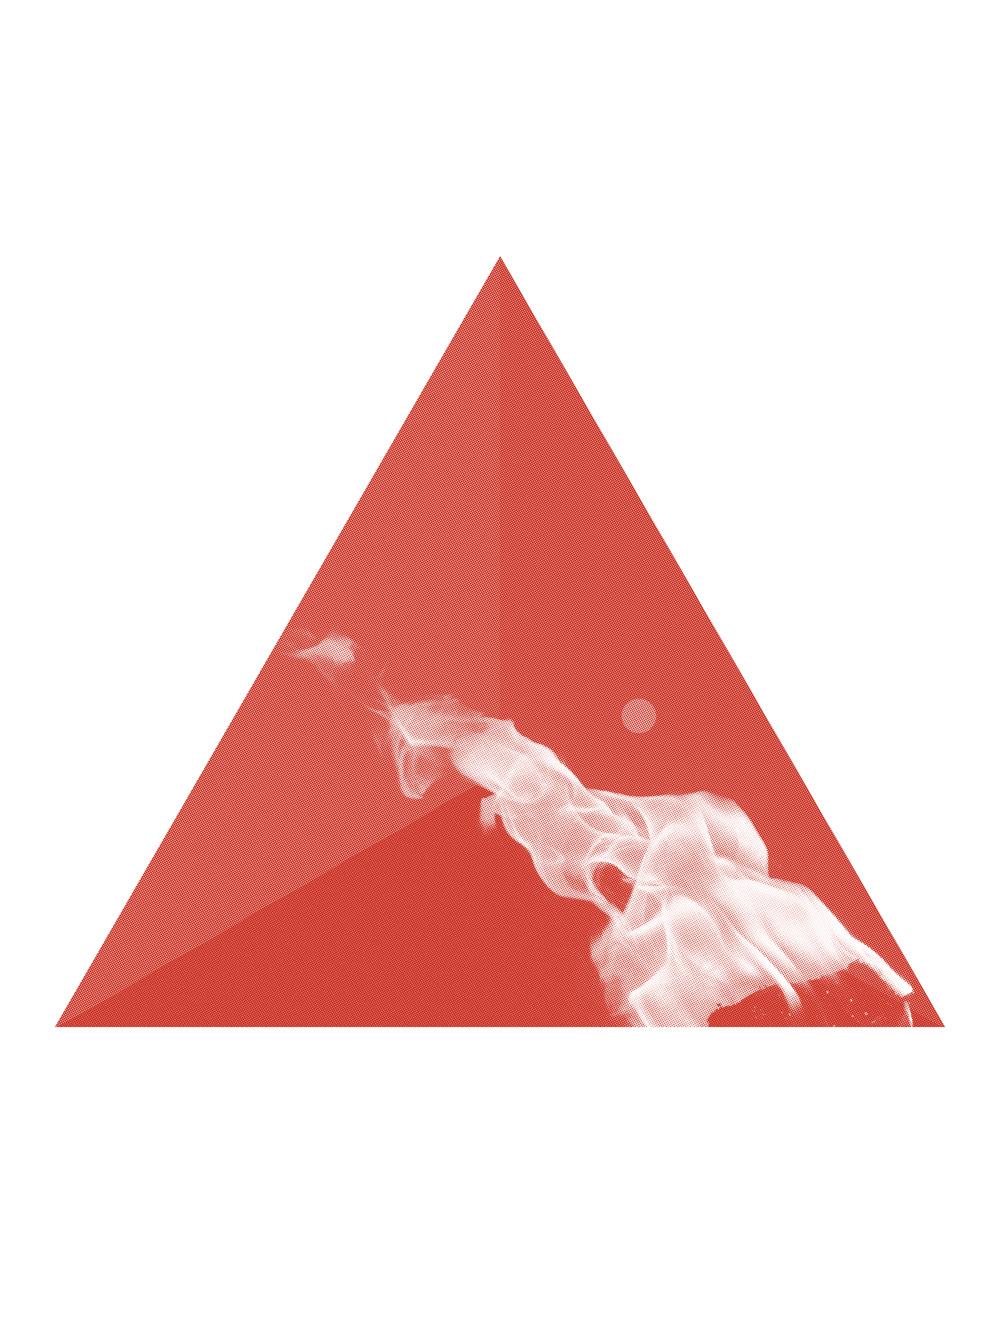 Fire-Prism-18x24_White.jpg